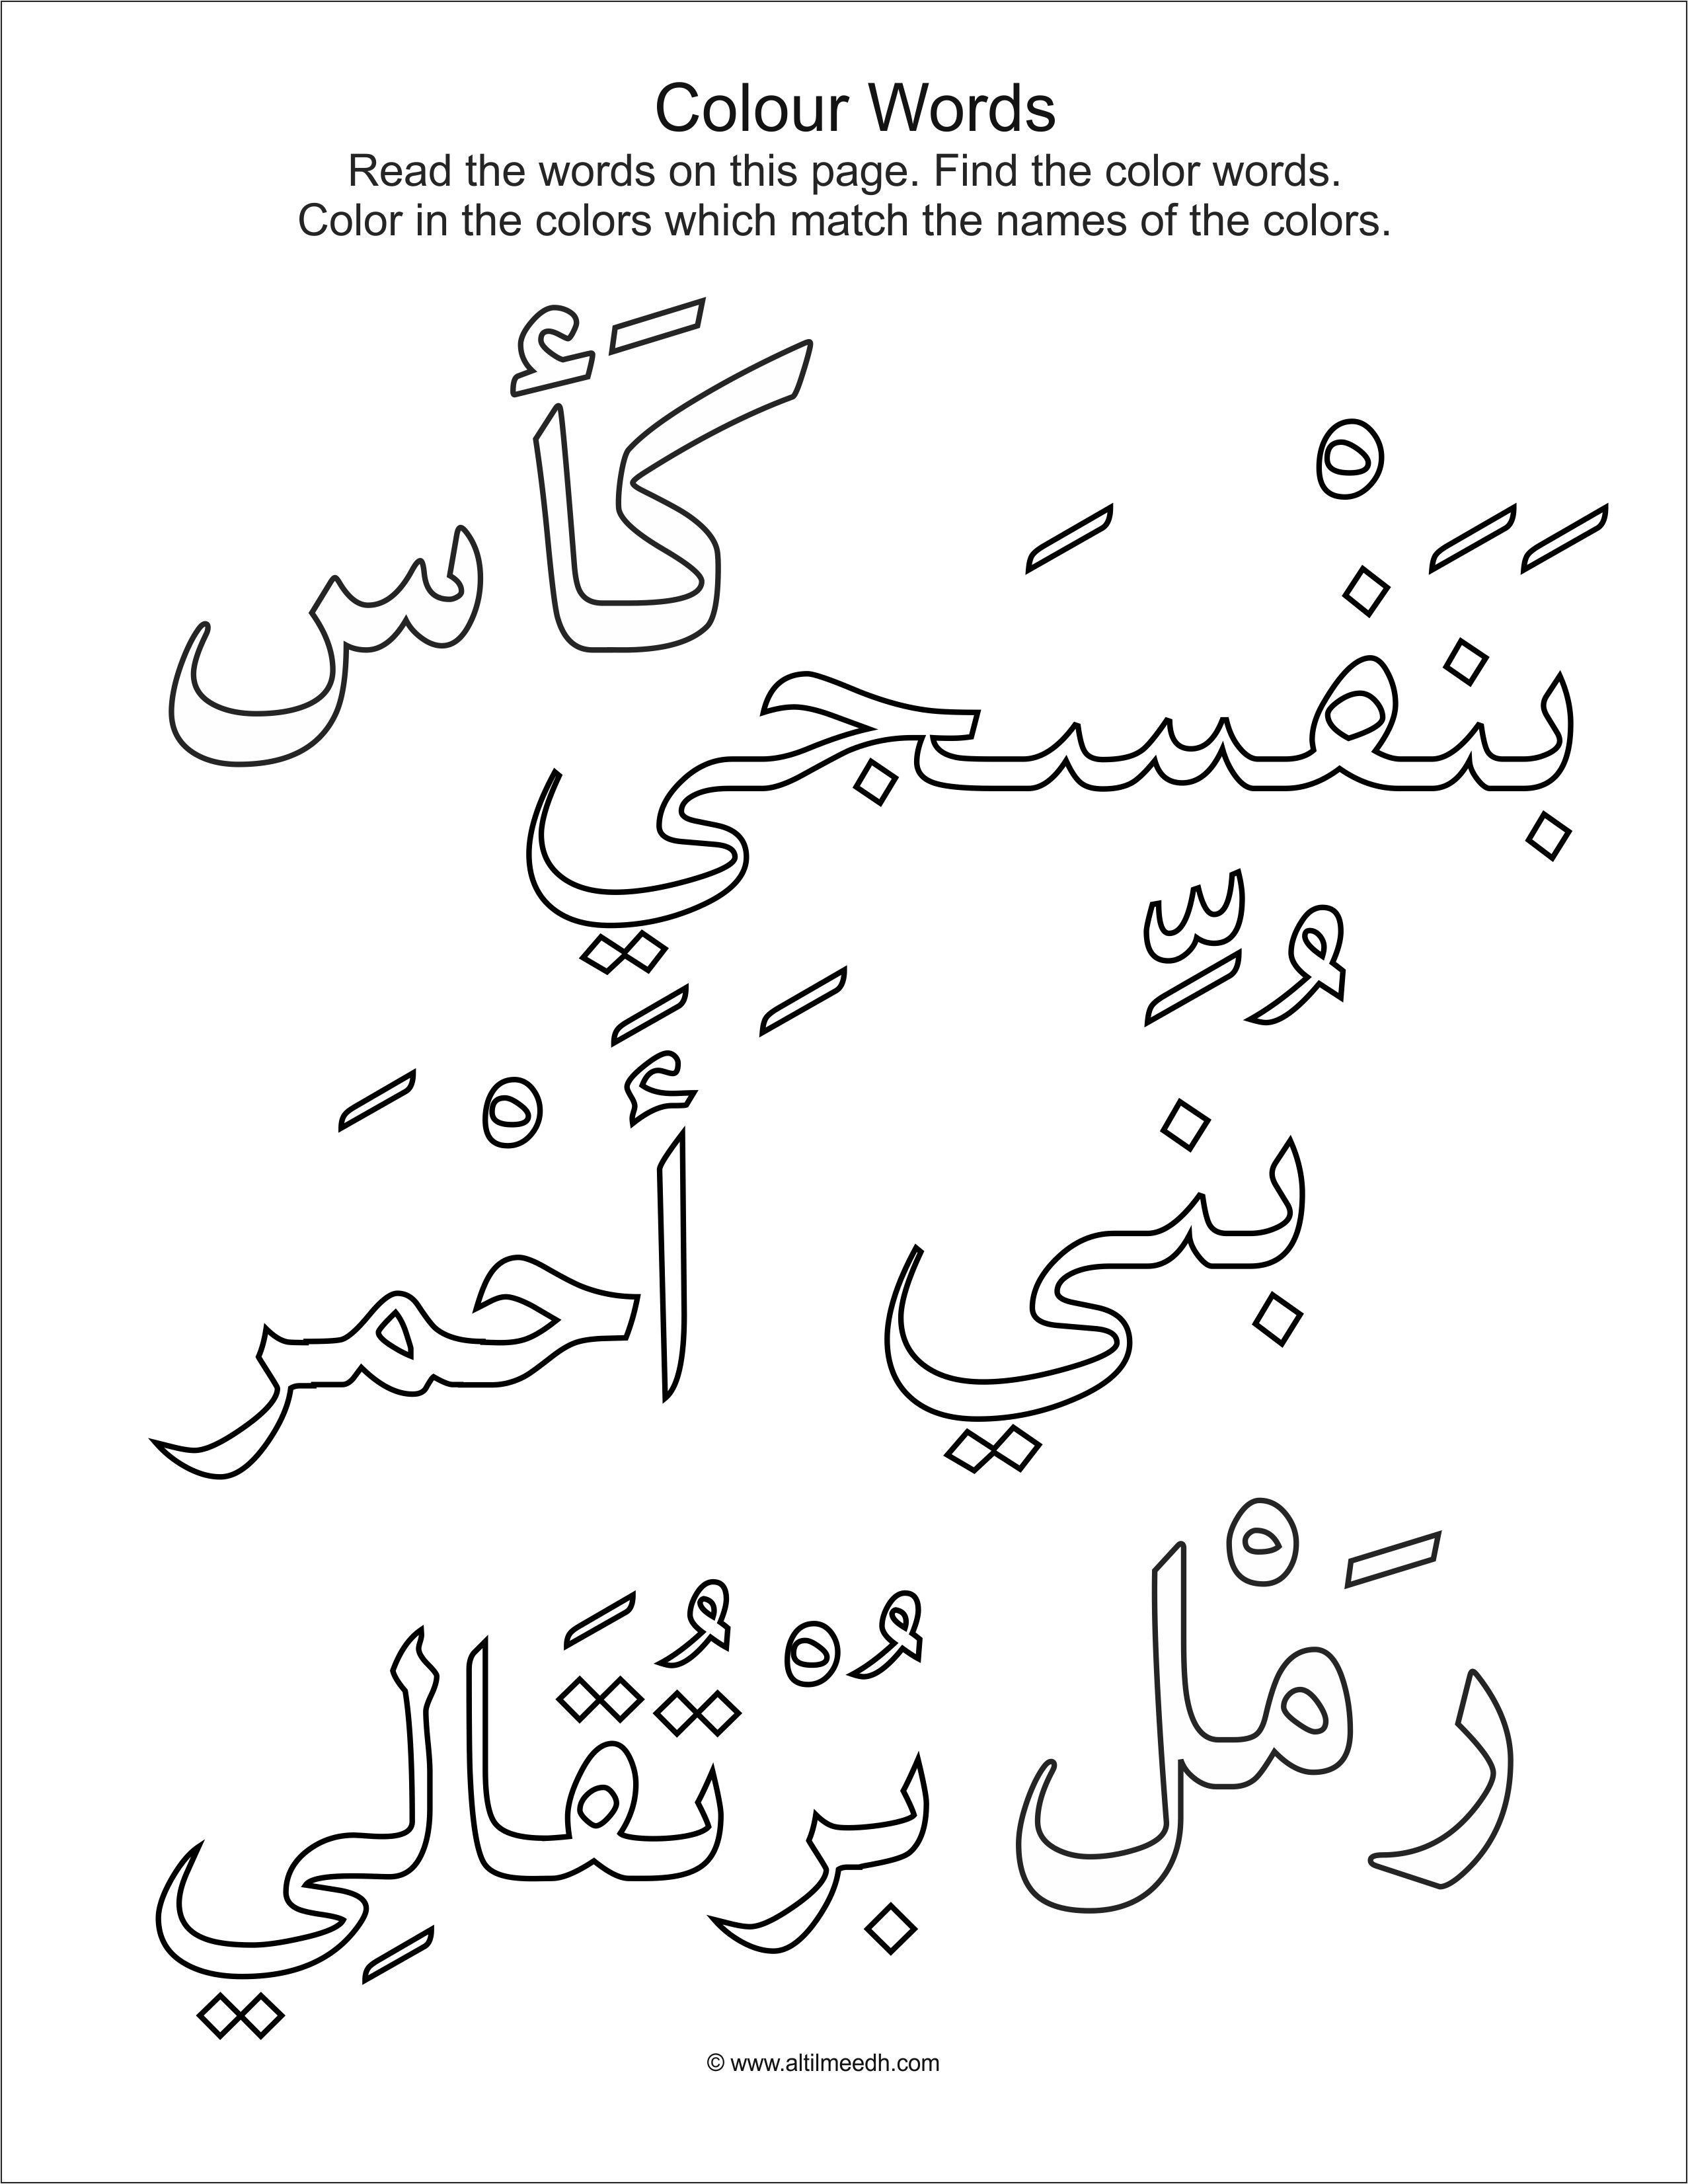 Uncategorized Color Words Worksheet color words worksheet set arabic playground view the full image image